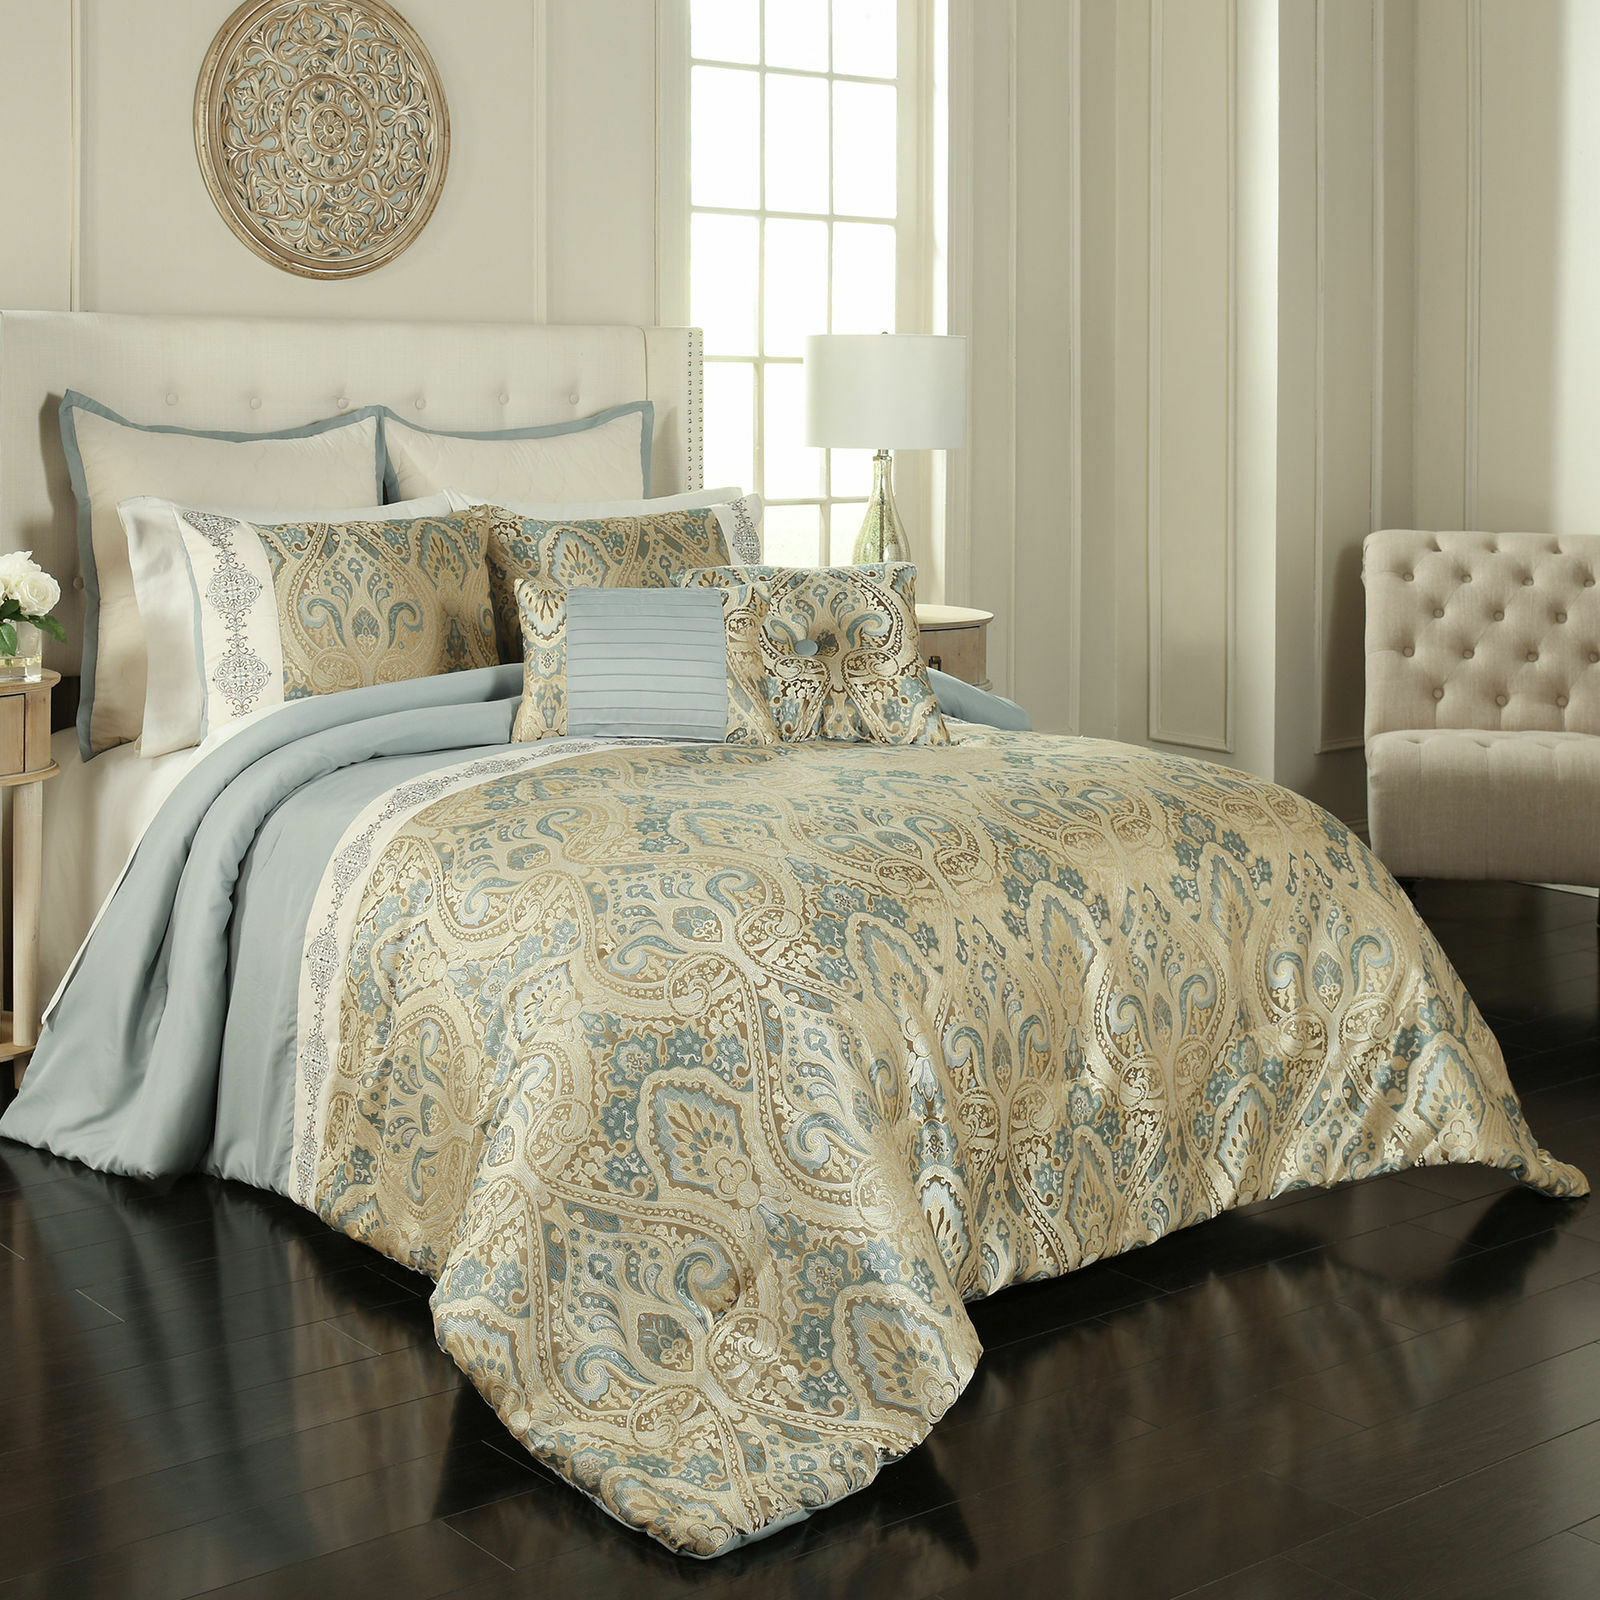 Luxurious Blau Jacquard Ornate Medallion 7 pcs Comforter King Queen Set